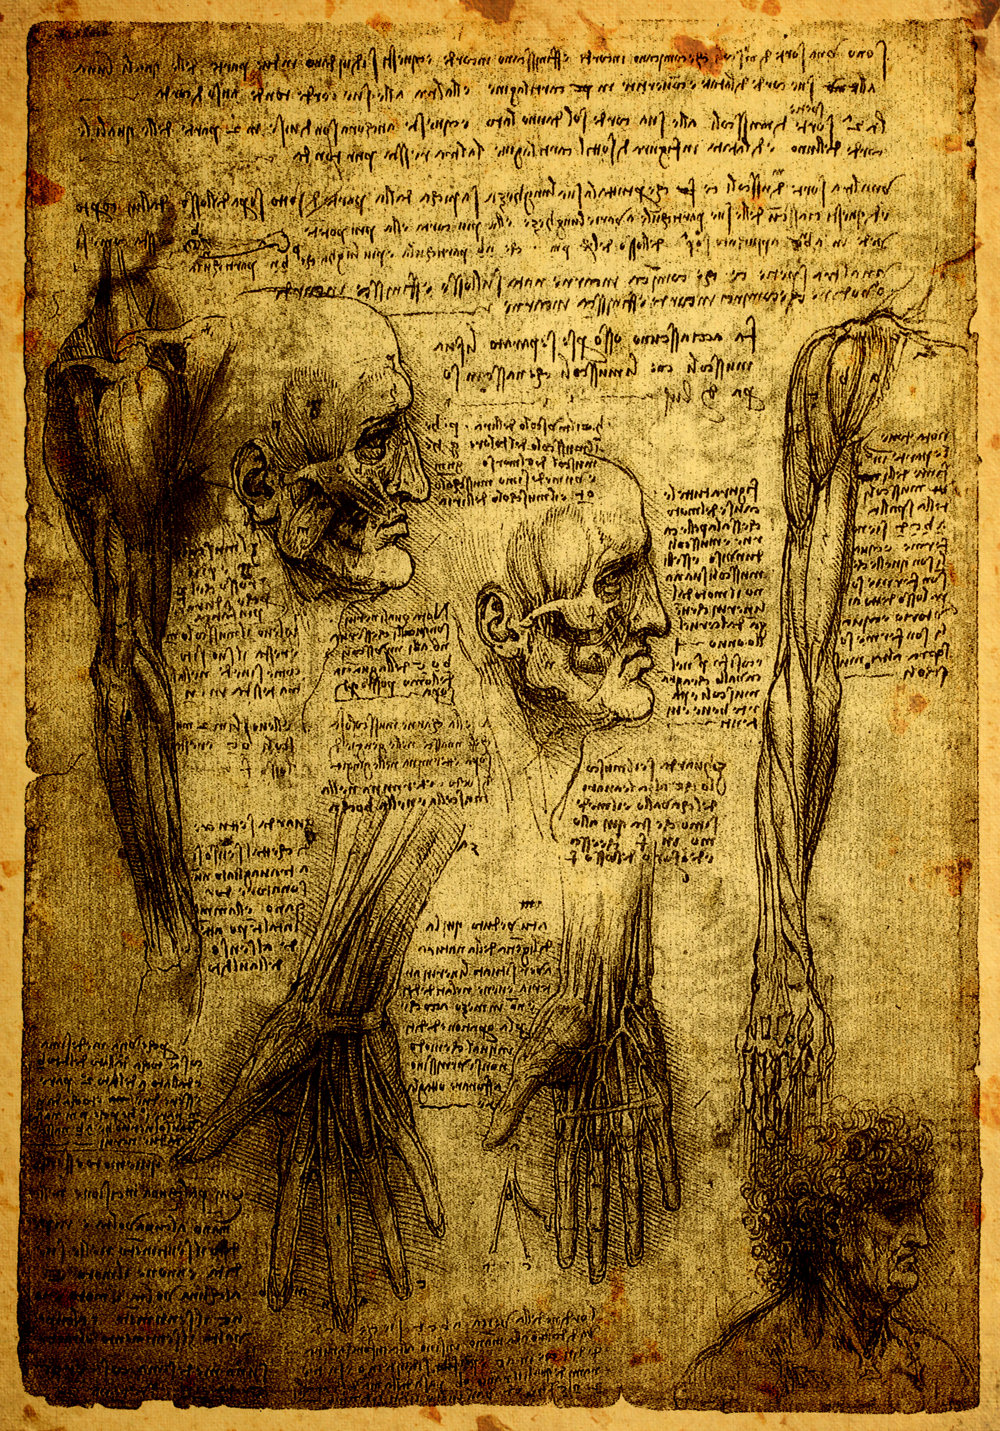 Da Vinci Study.jpeg